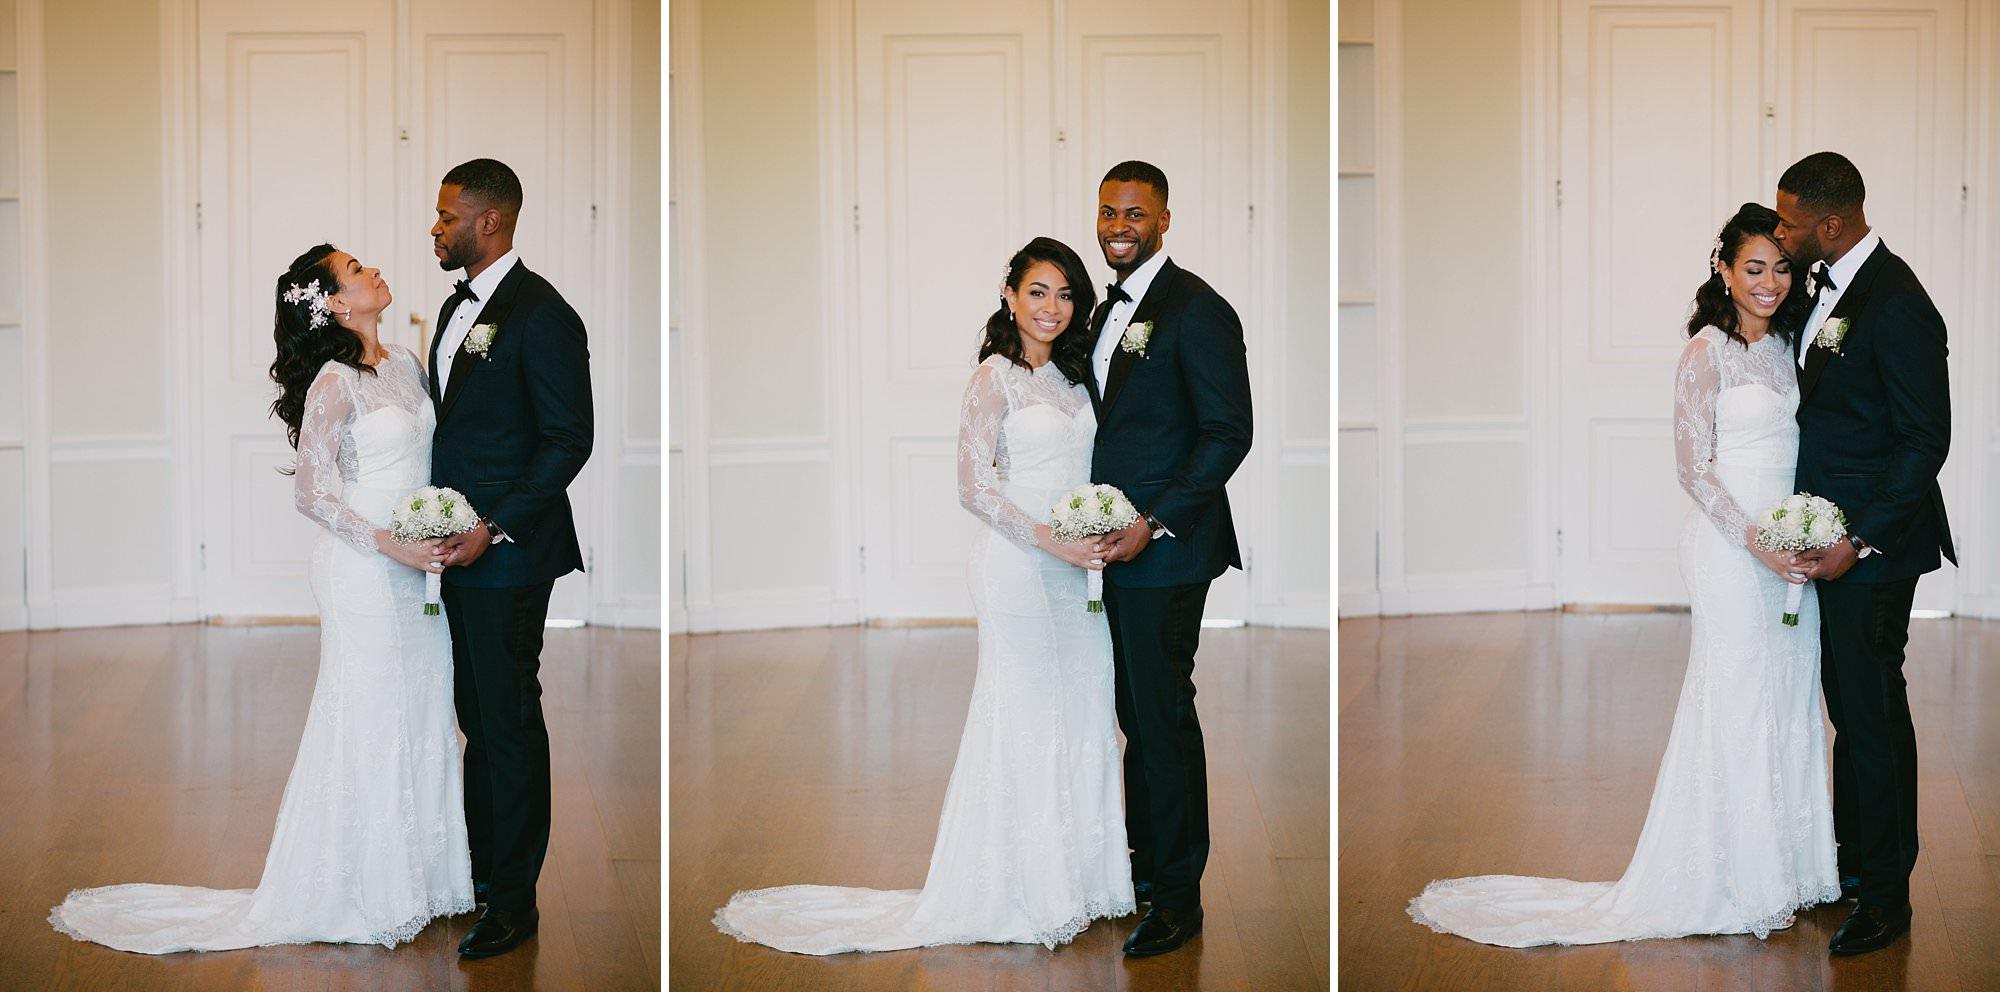 asia house london wedding photographer 012 - Rachel + Gabriel   Asia House Wedding Photography